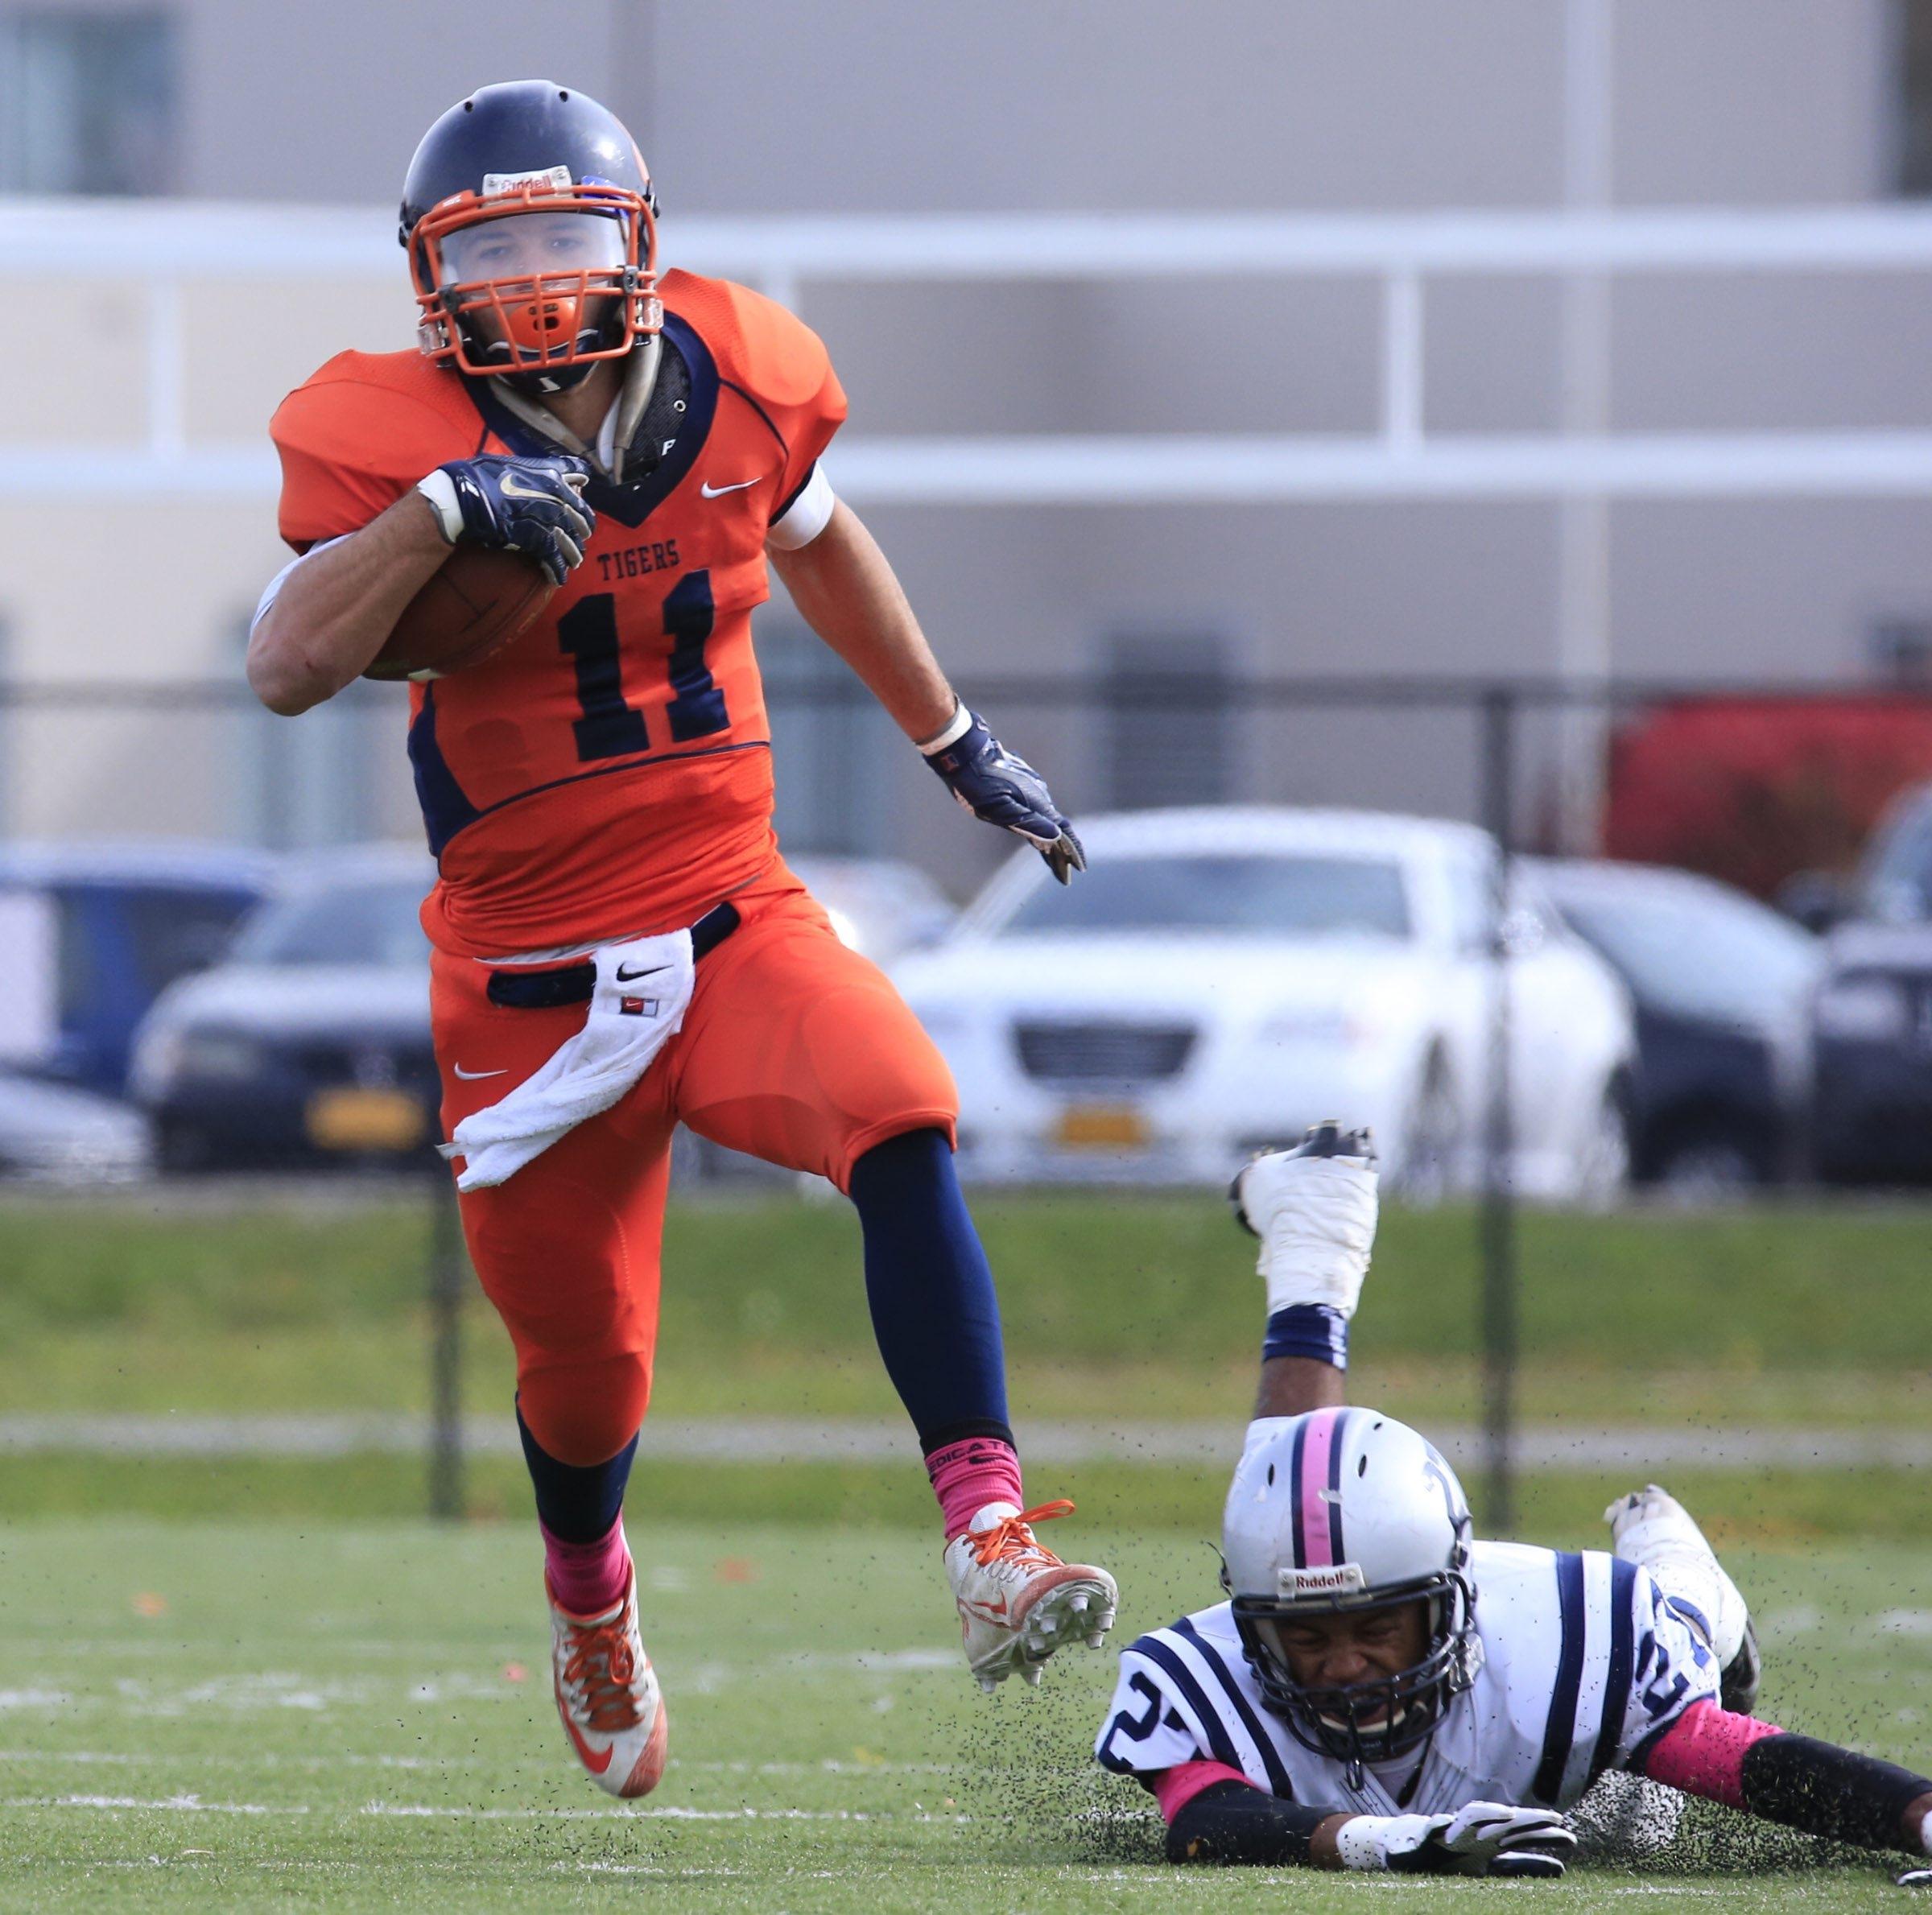 Bennett's Isaiah McDuffie runs for a touchdown Saturday against Lackawanna at All High Stadium. Bennett won, 56-7.